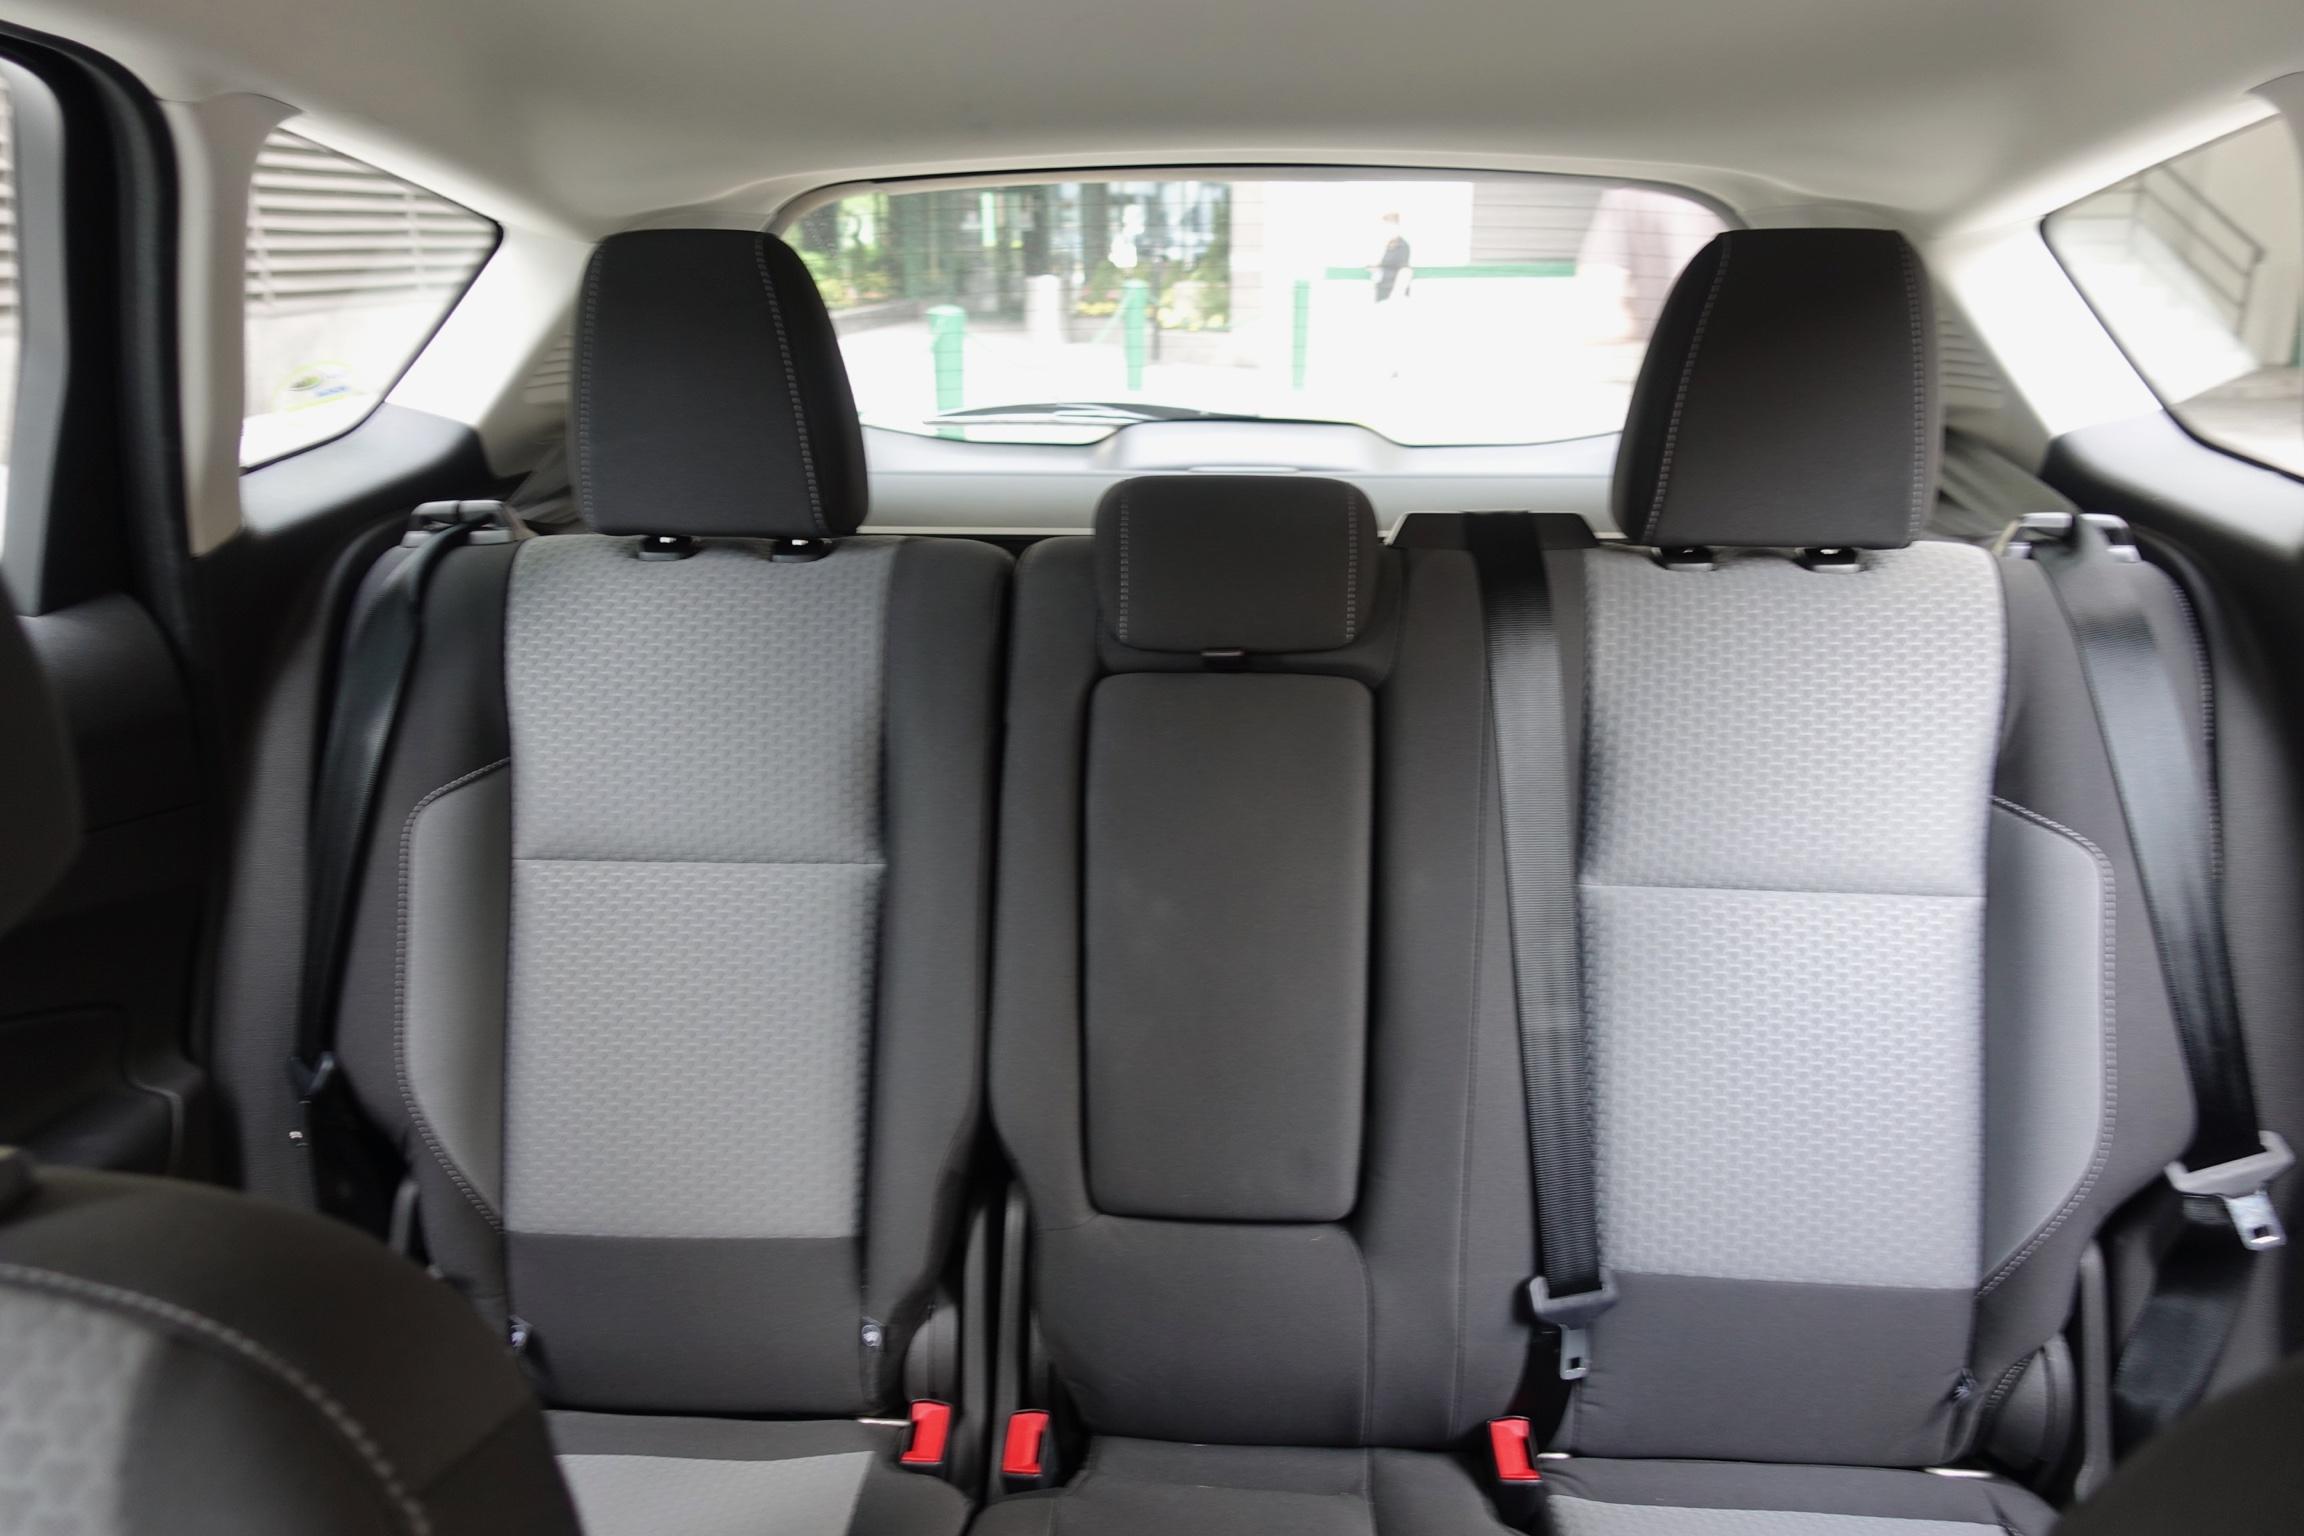 Ford C-MAX Interior